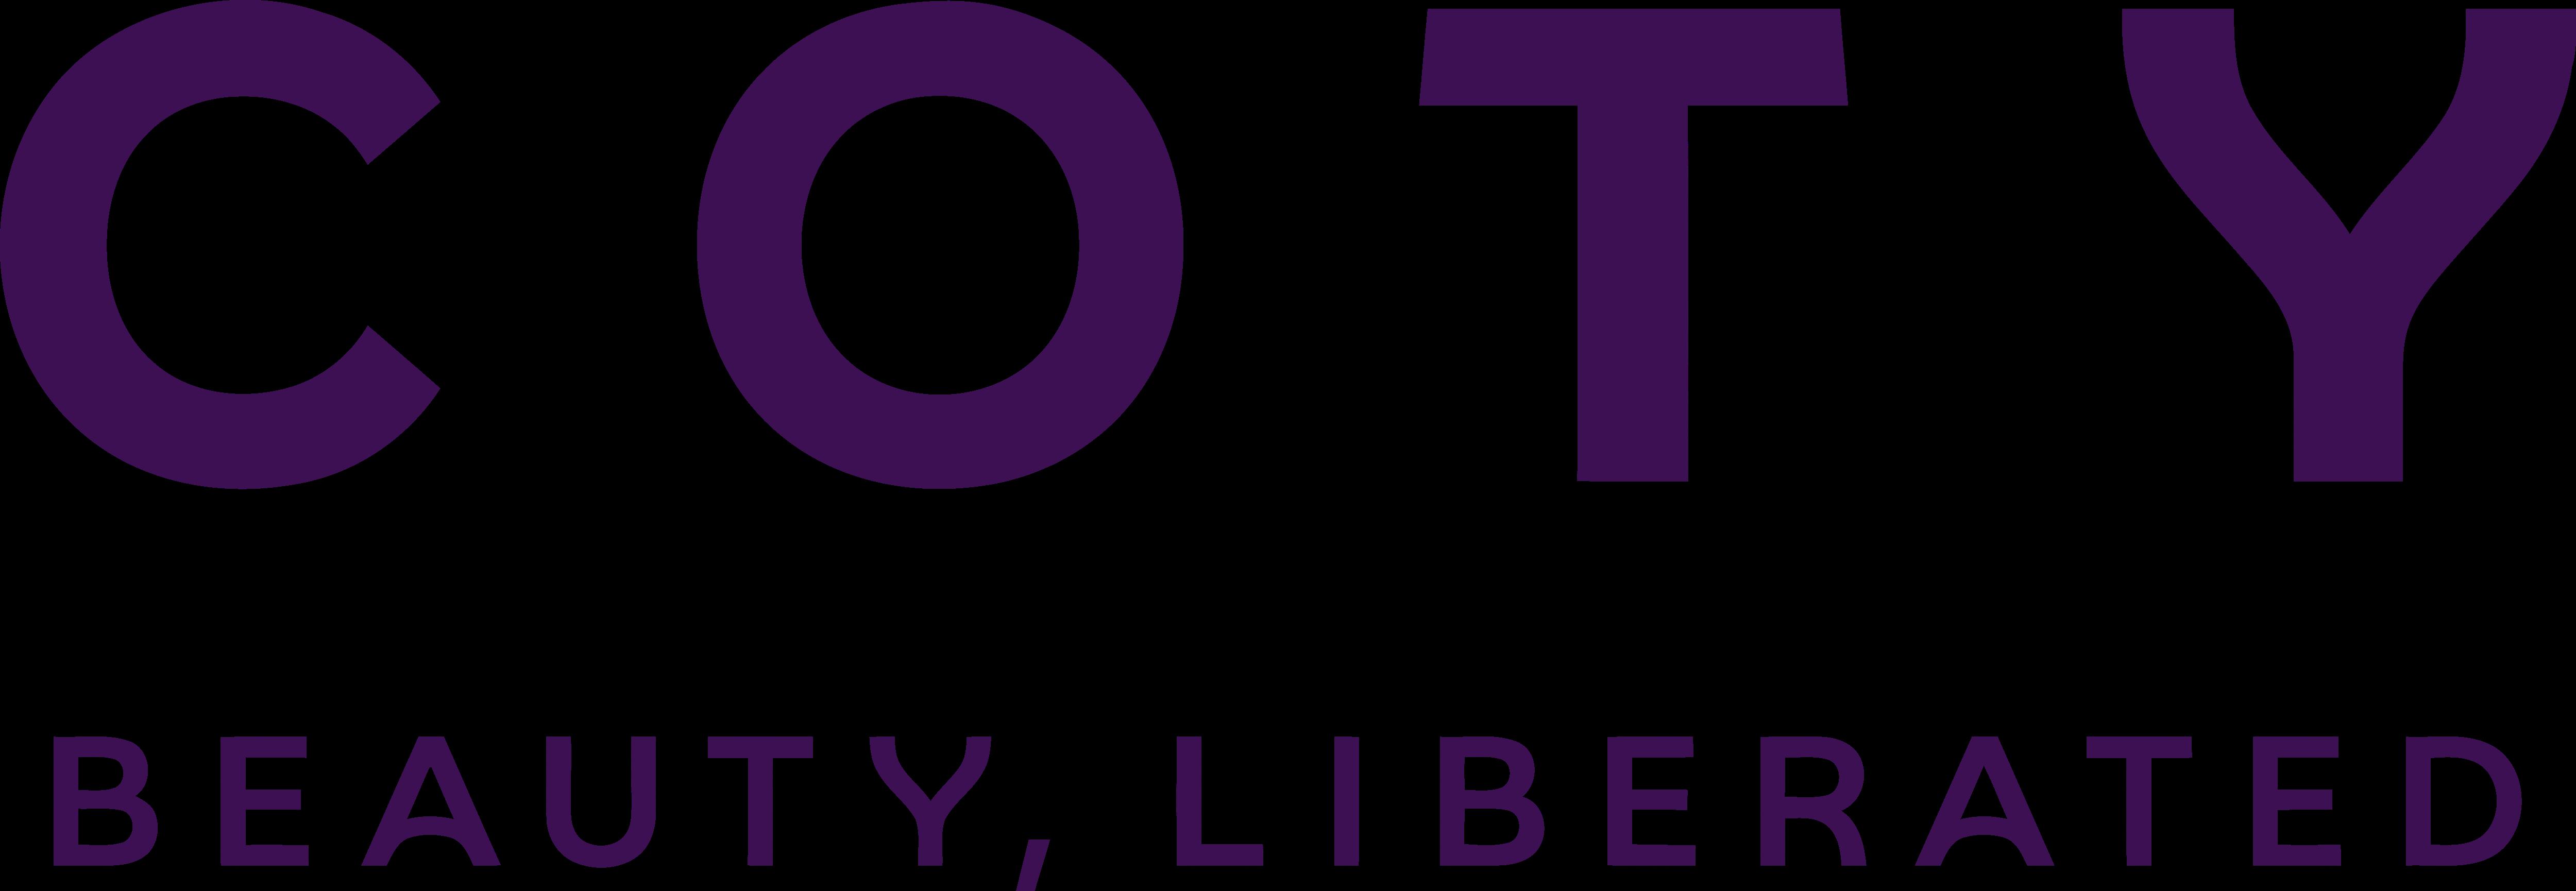 Coty Inc Logos Download